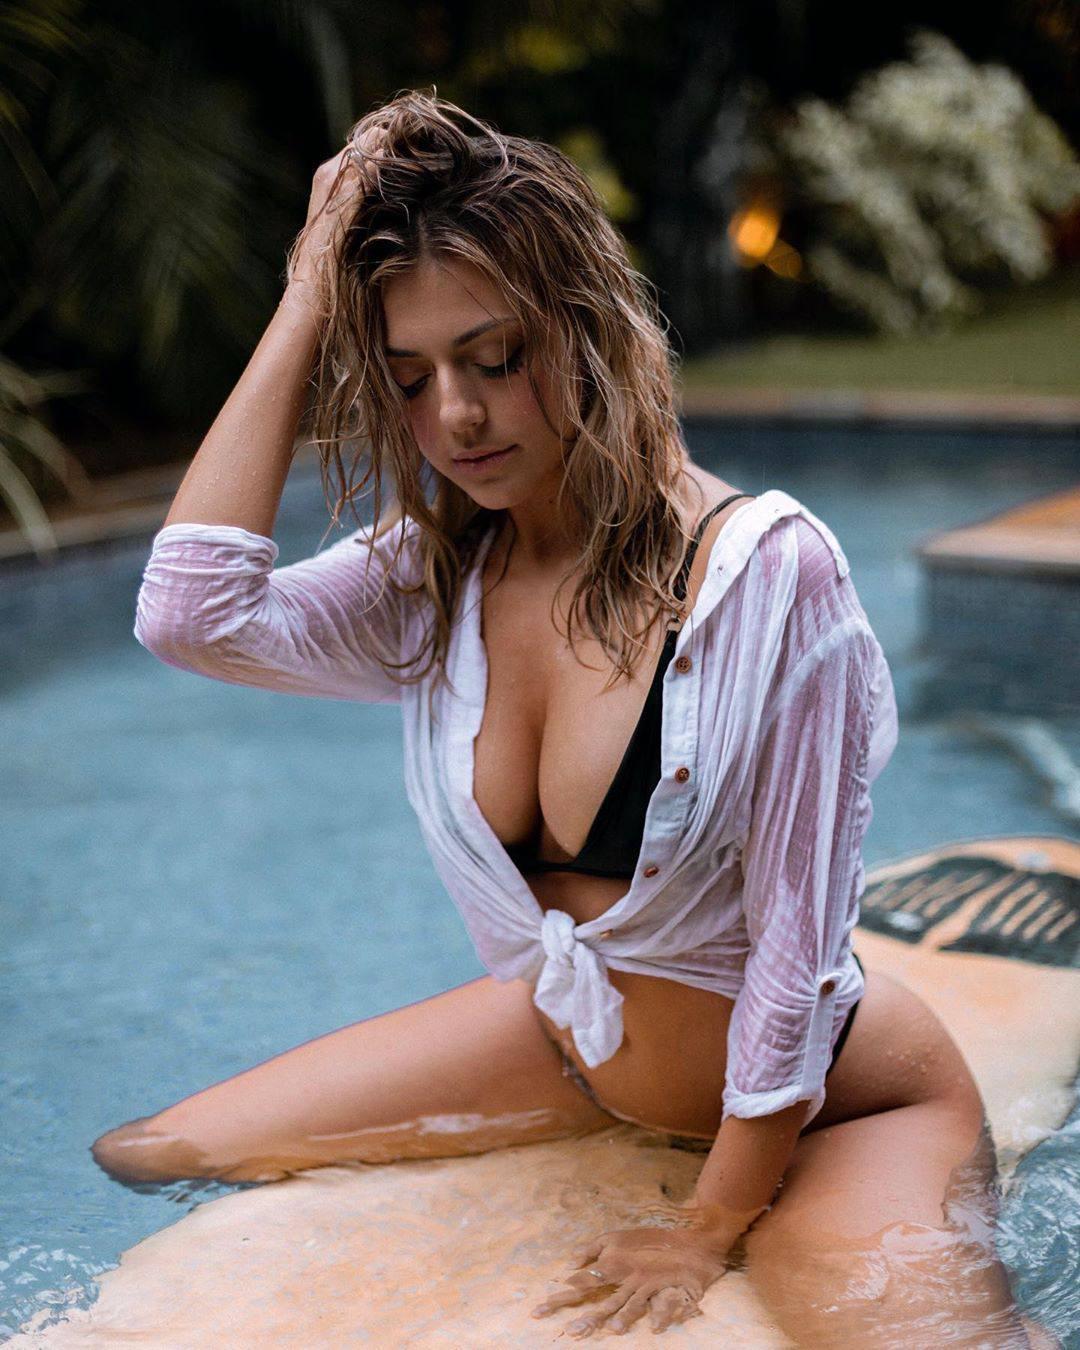 Lara Ashley Hot Pictures